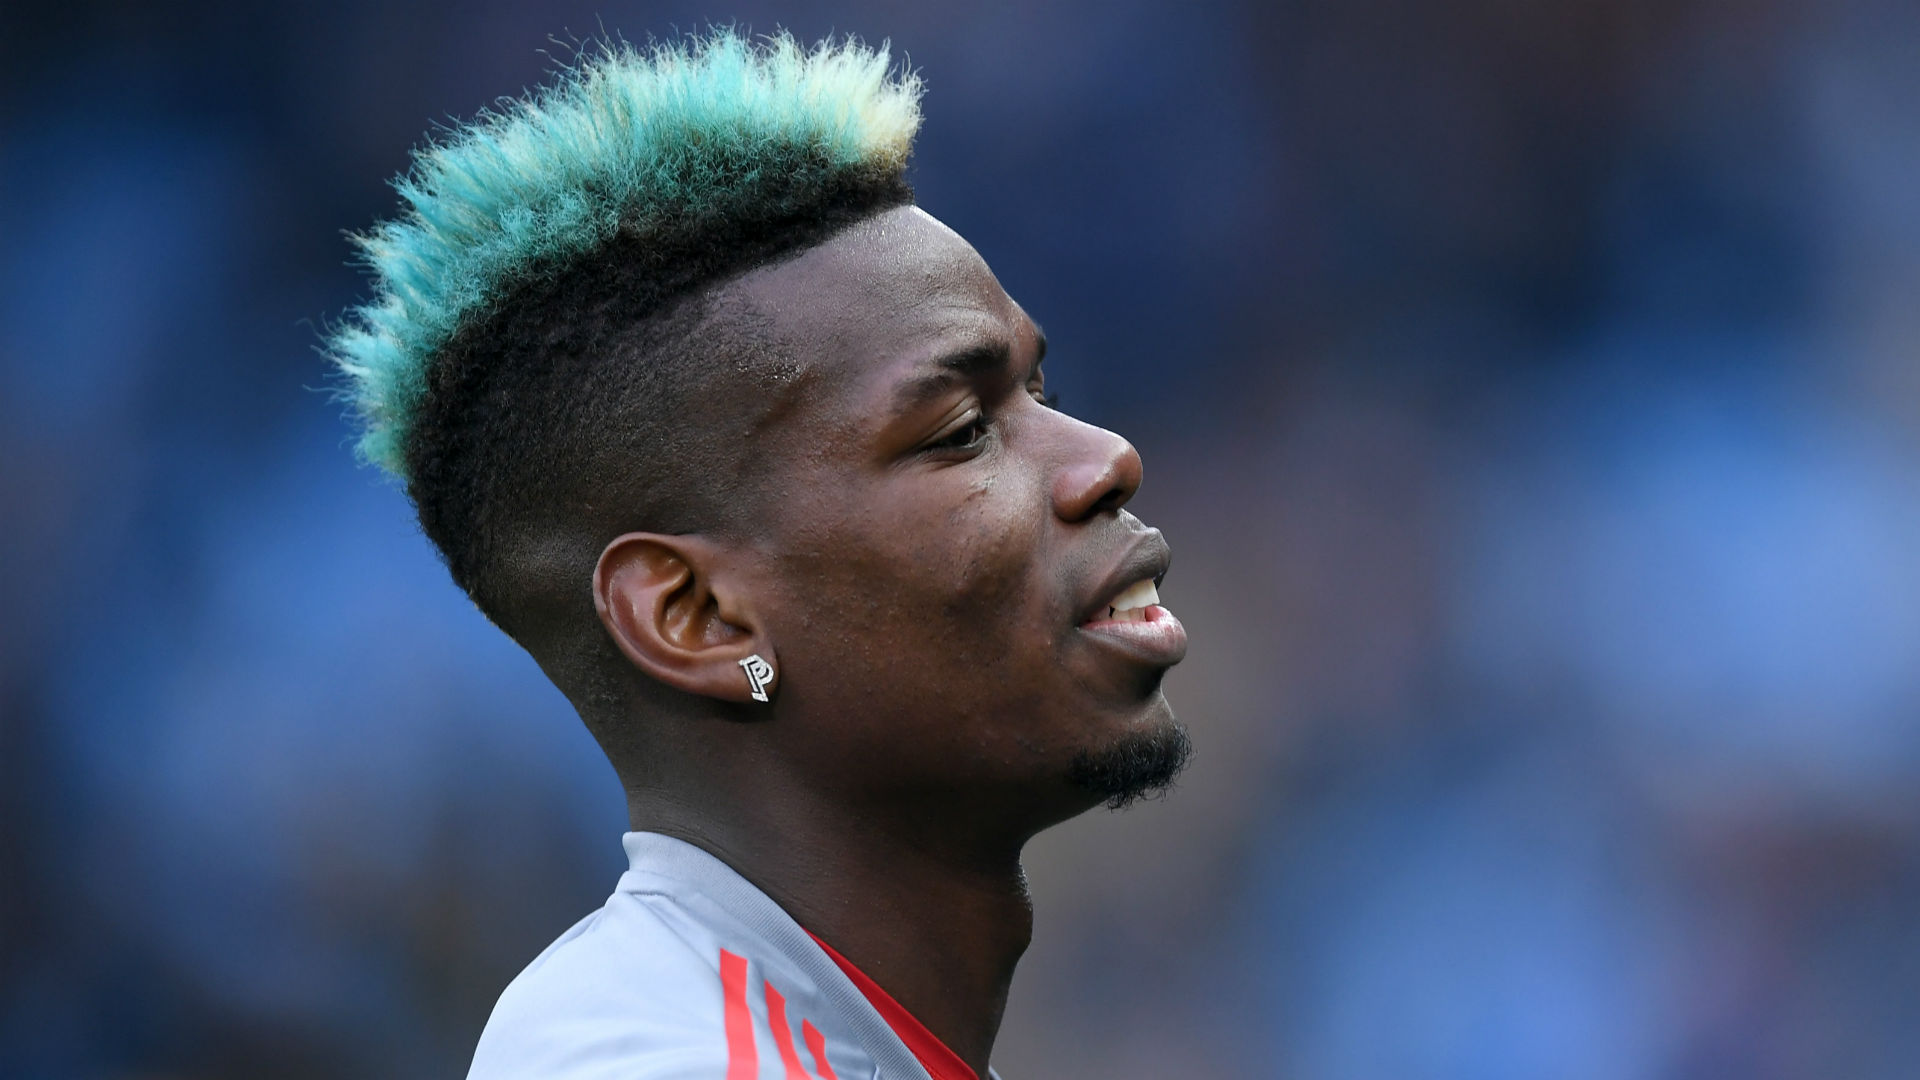 Paul Pogba: Paul Pogba Haircuts: Man Utd Star's Styles & Who Cuts His